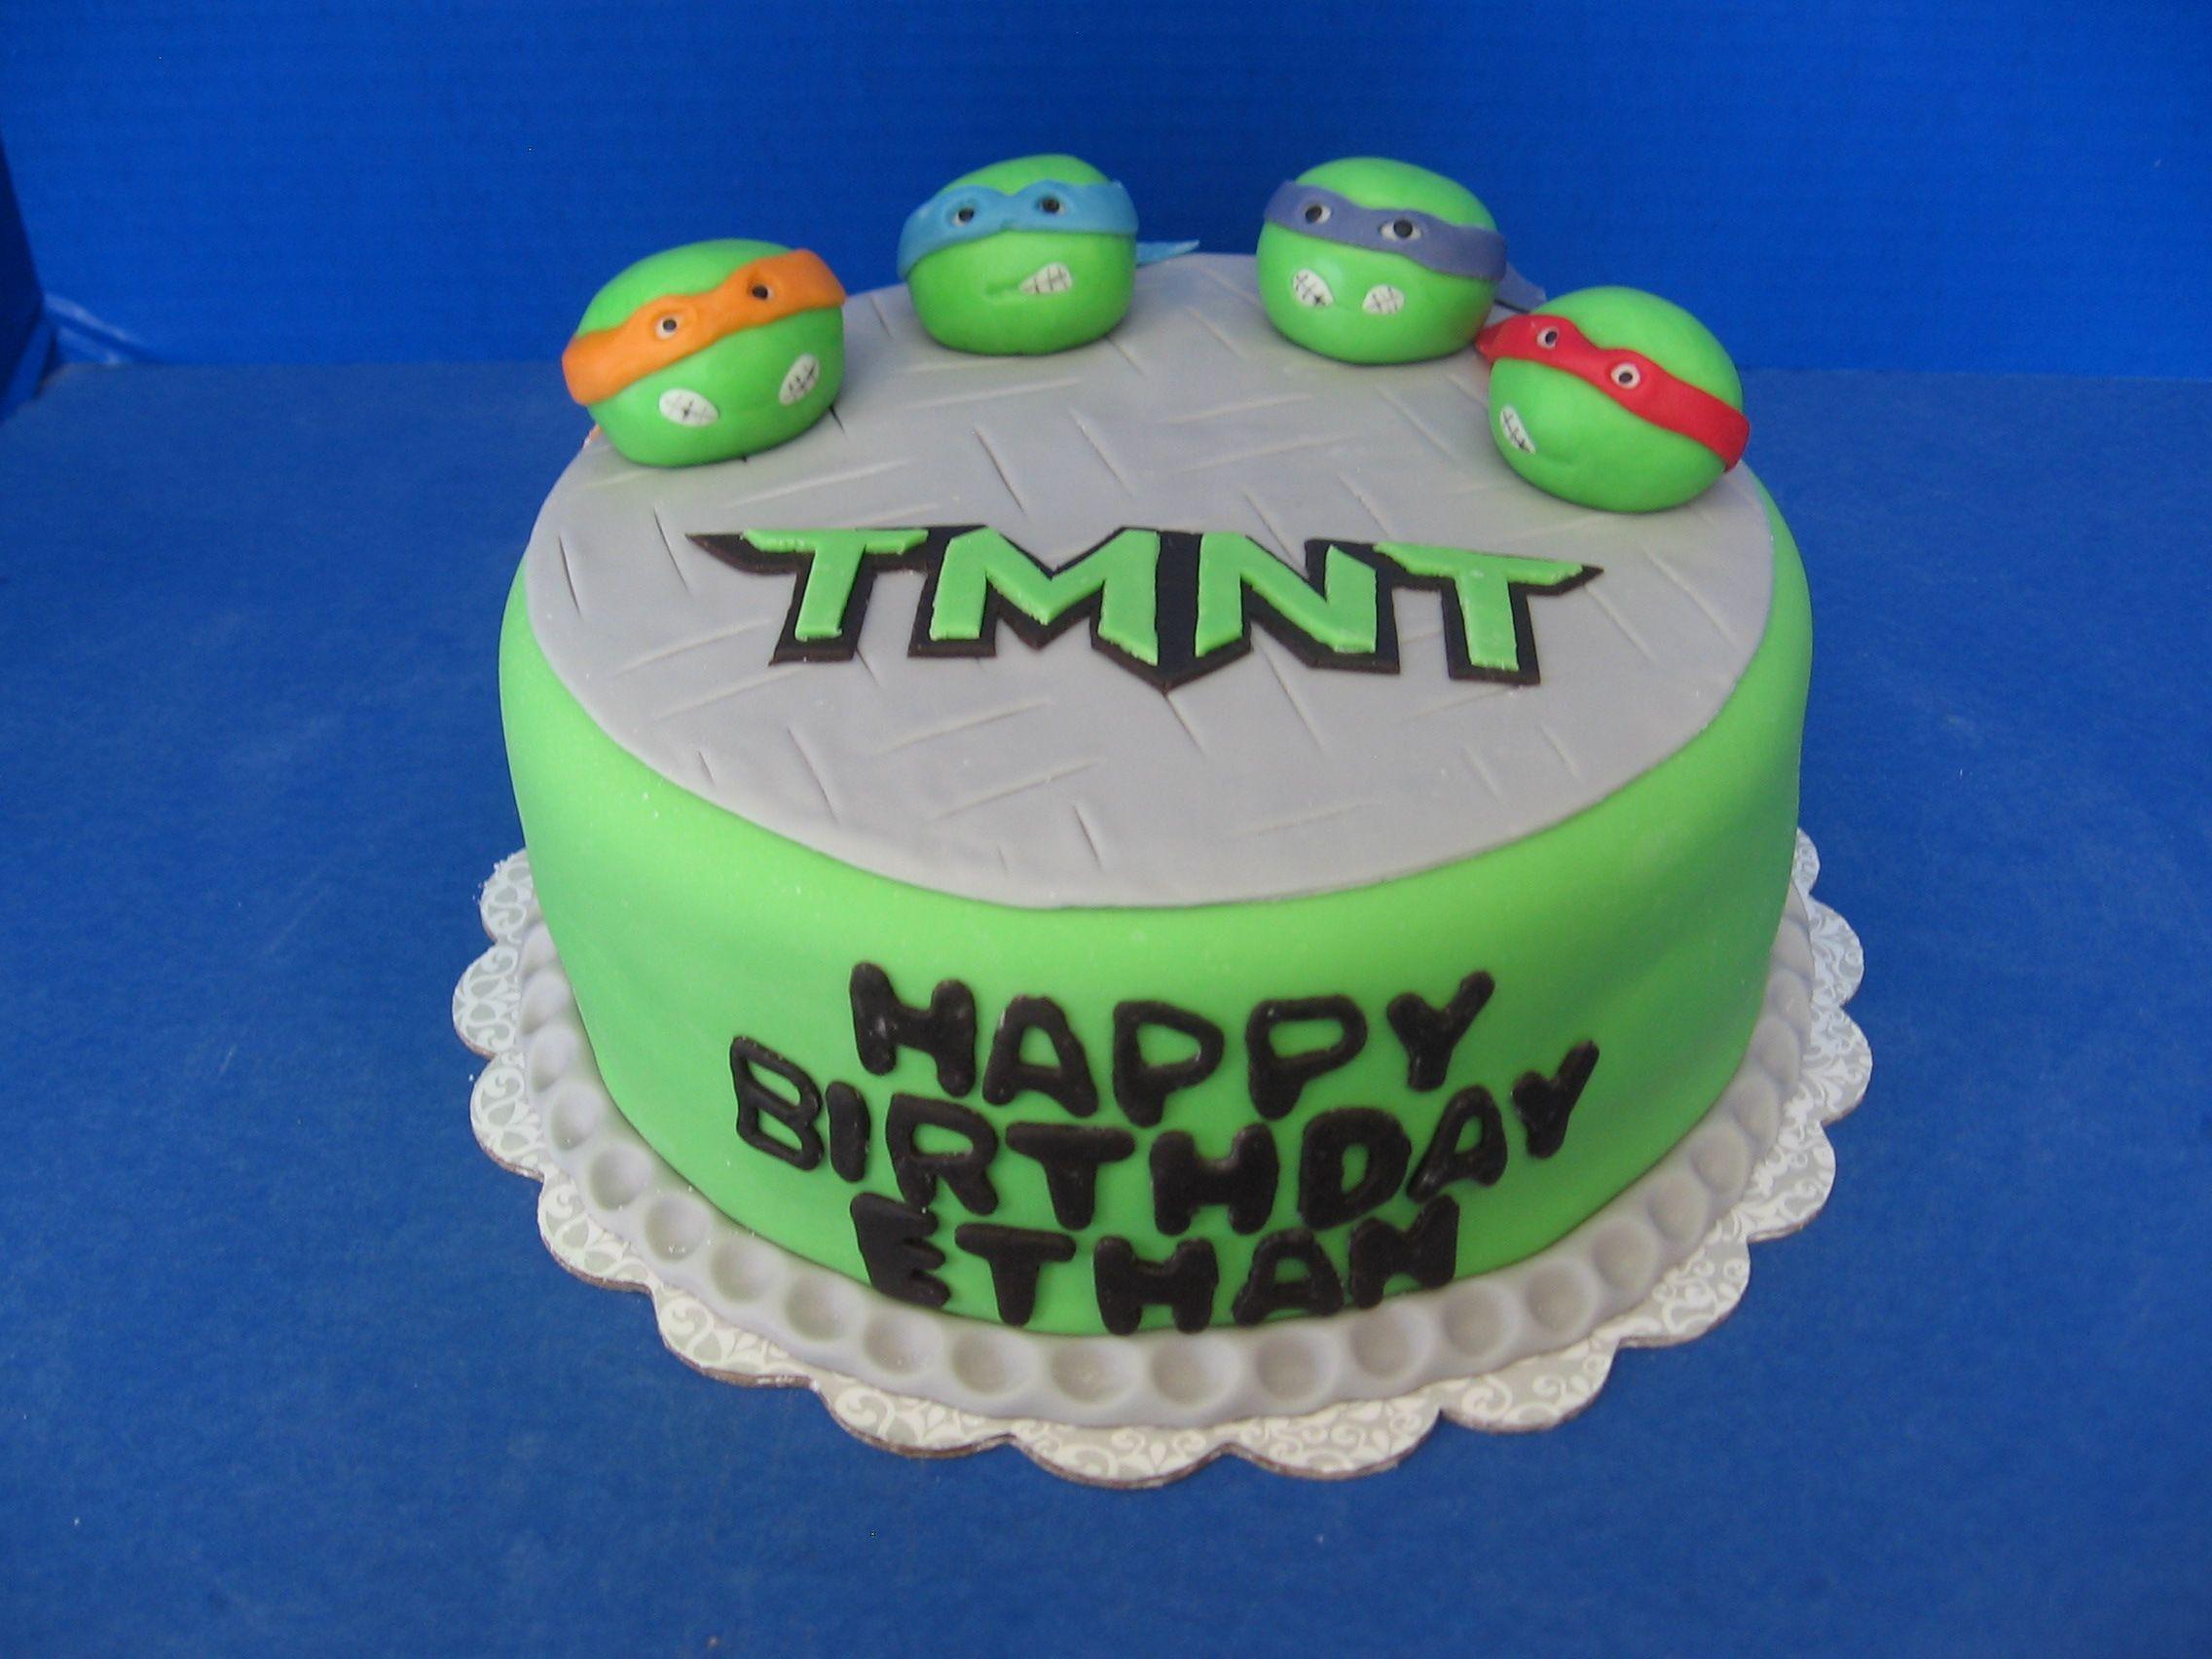 Teenage Mutant Ninja Turtle Cake Sweets to the Sweet Cakes